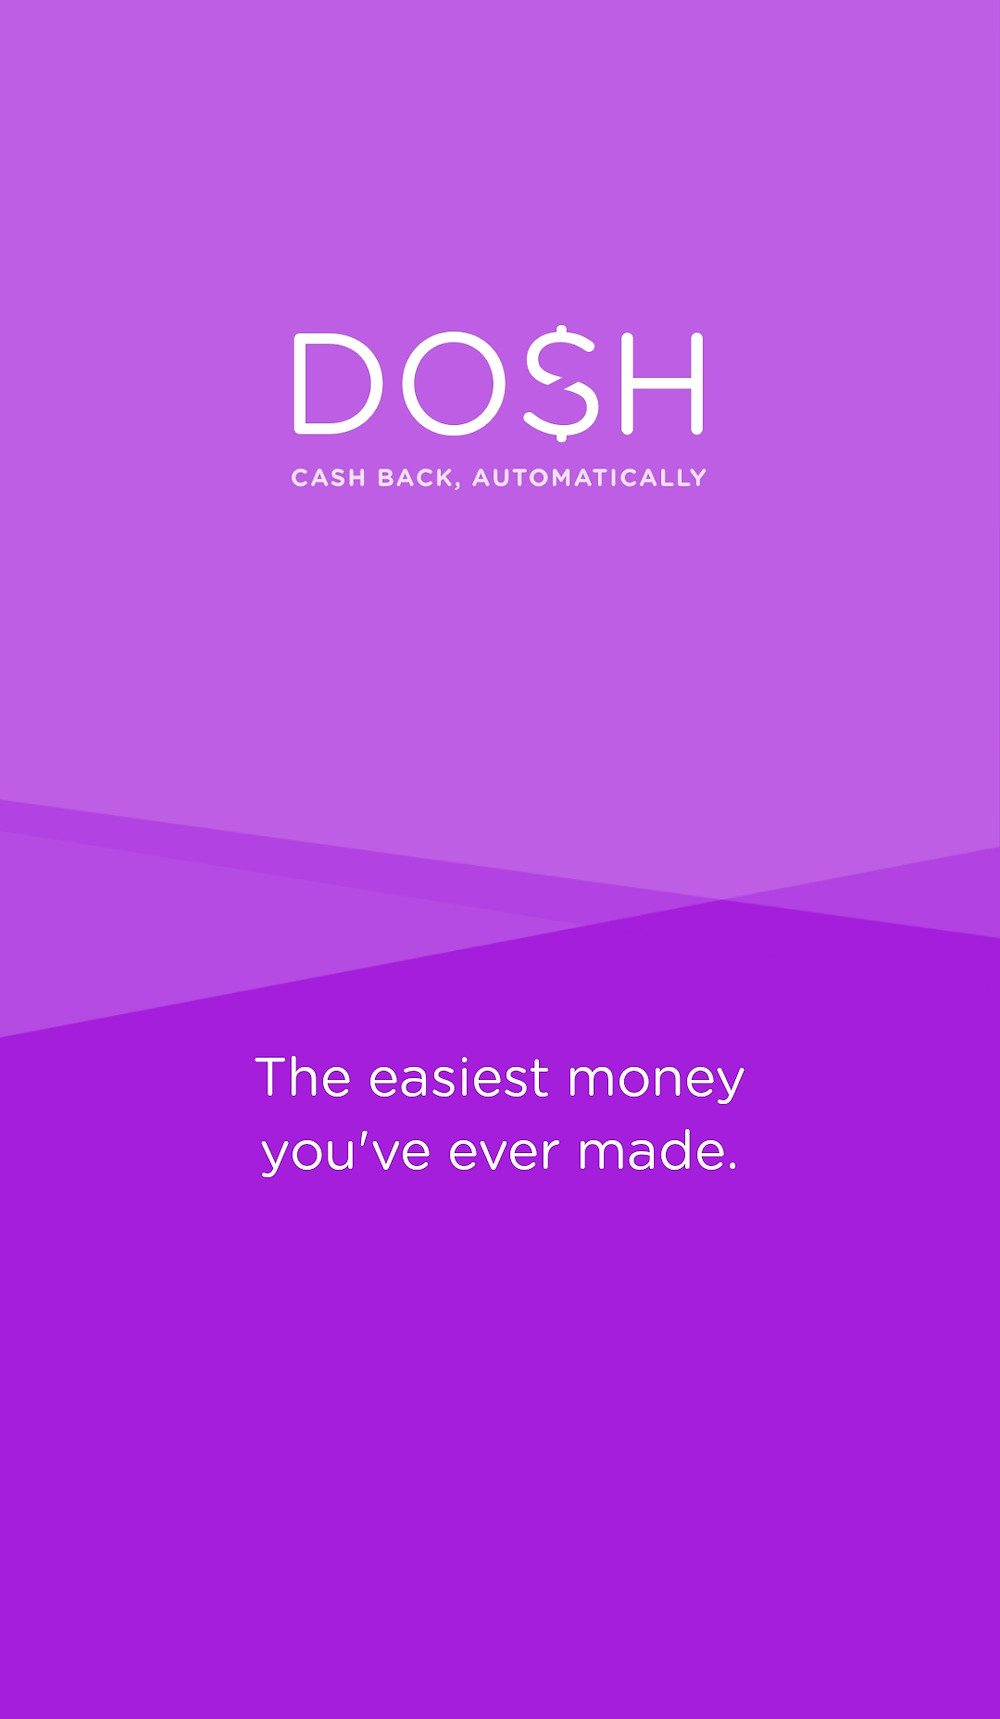 DOSH, App